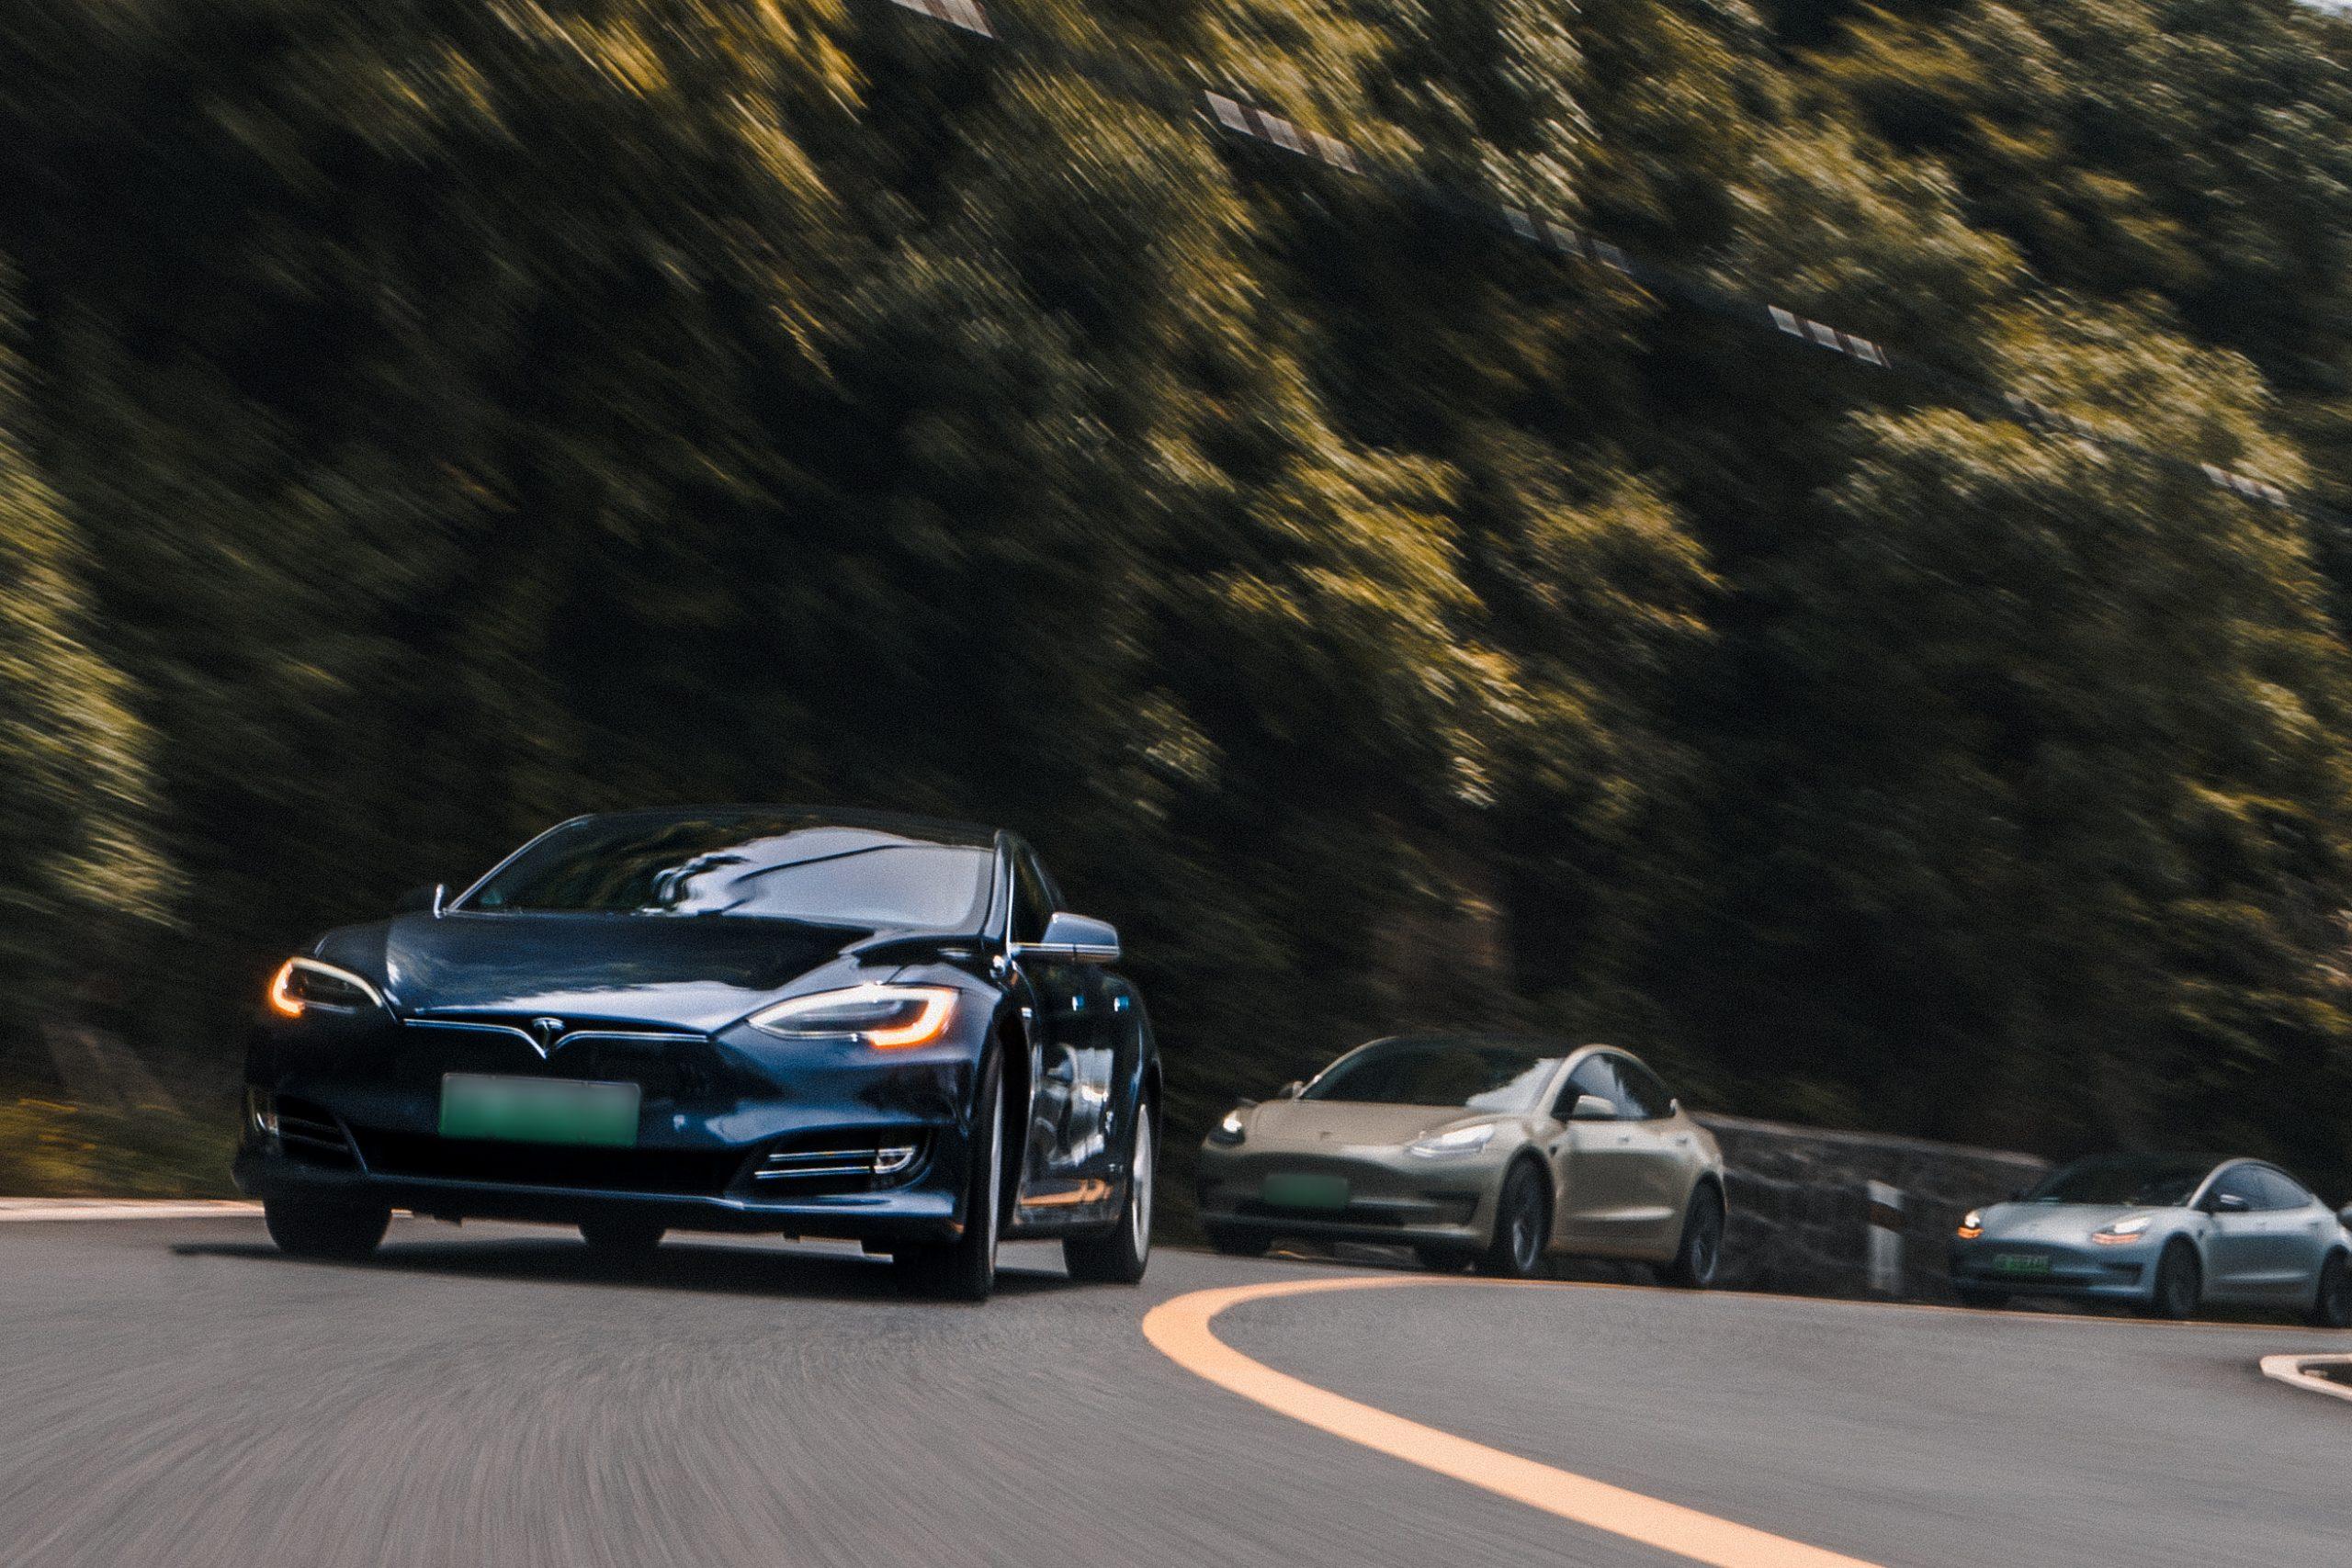 Tesla-rd-center-recruitment-25k-car